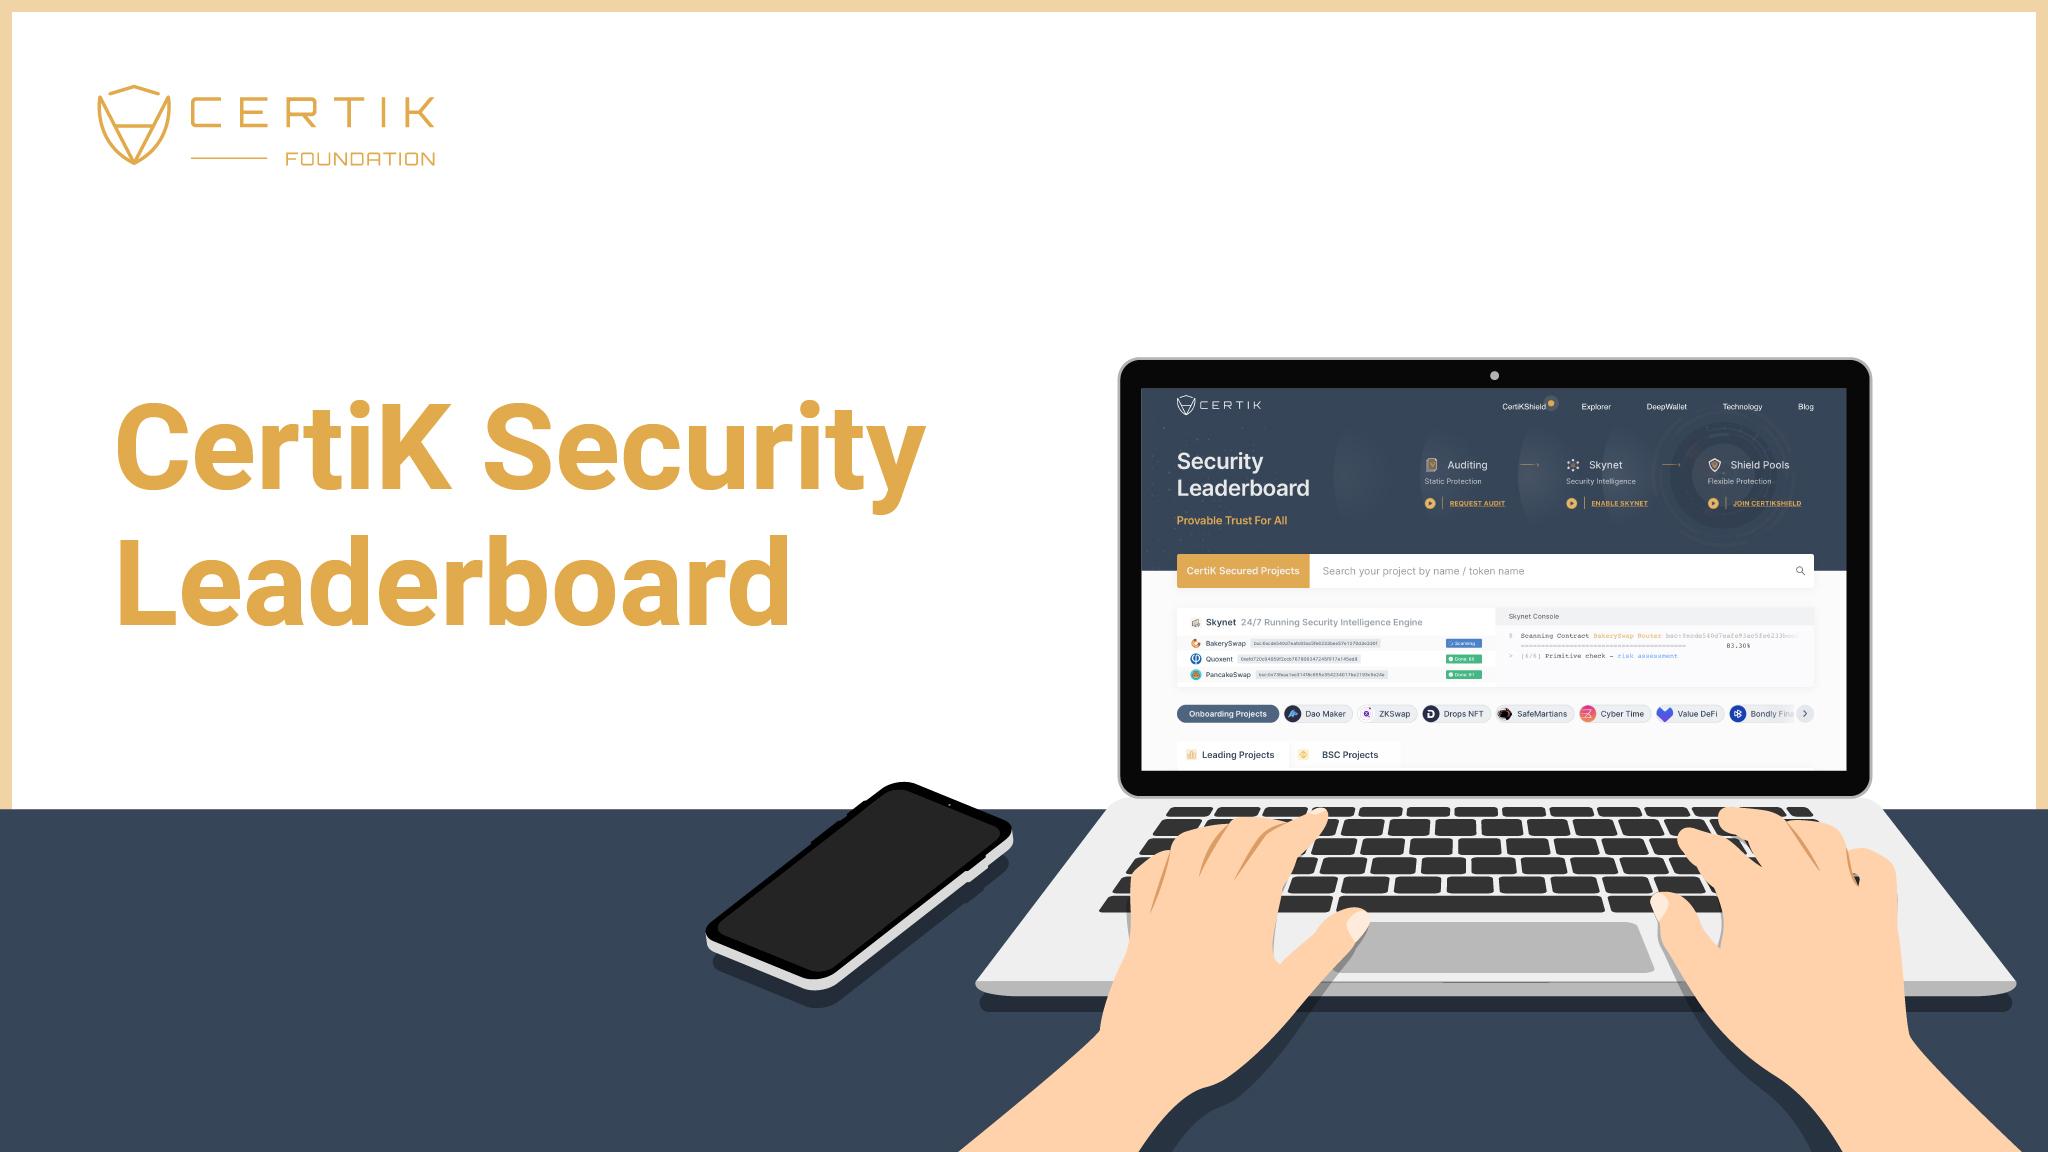 CertiK Security Leaderboard